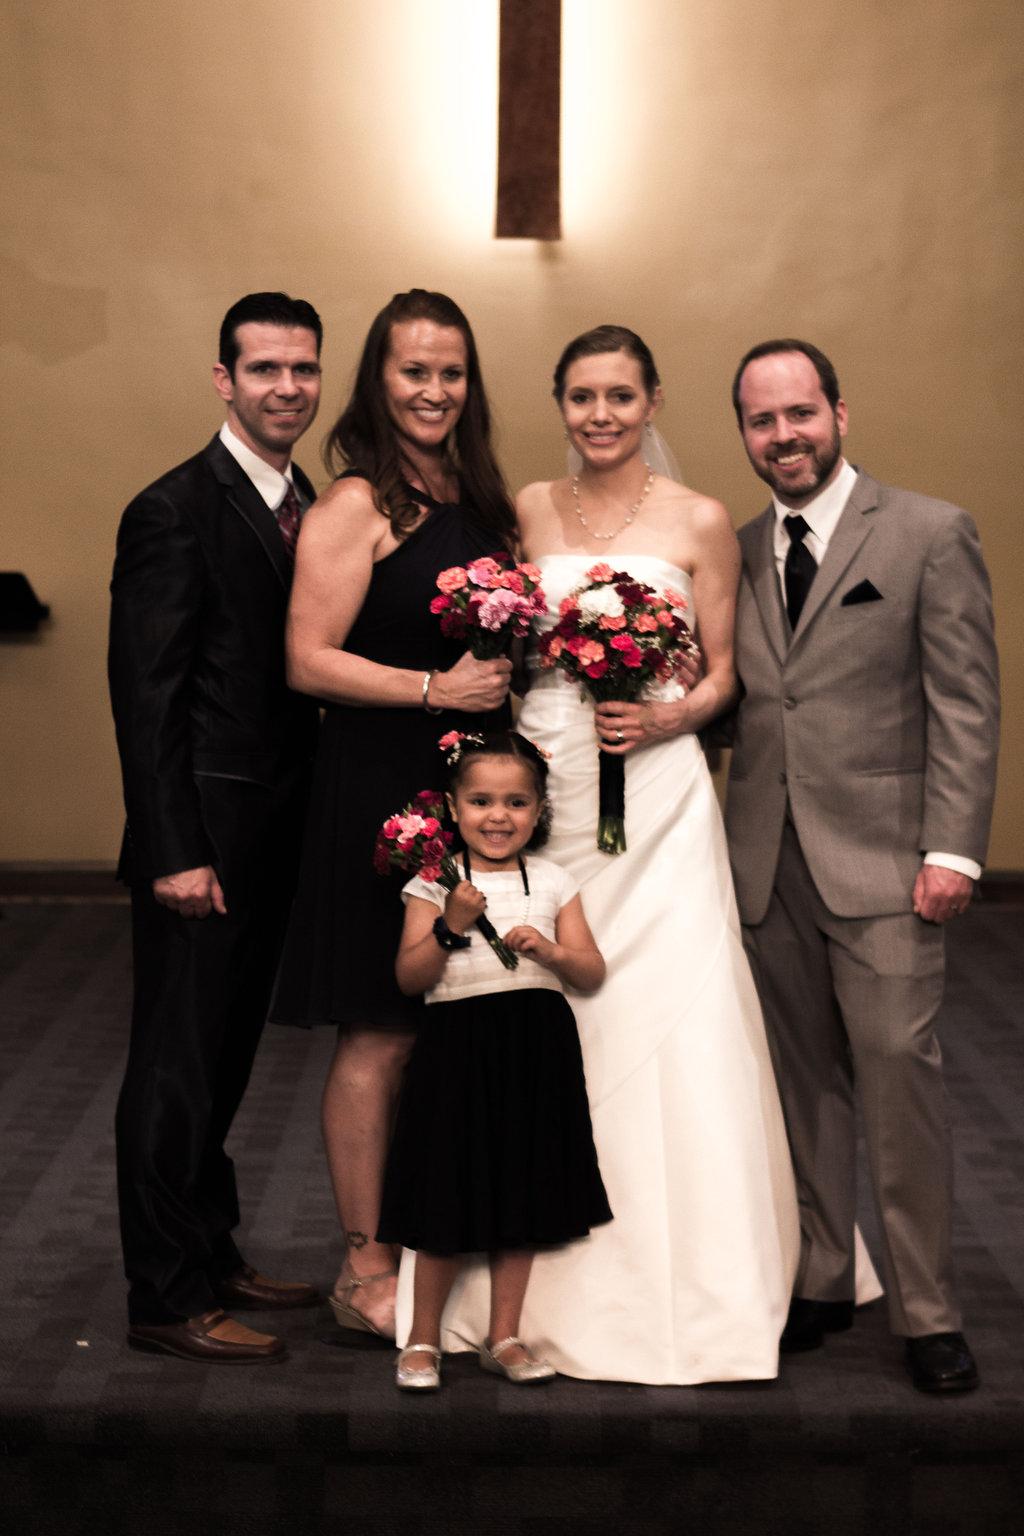 jakeandsuze_weddingselects-143.jpg